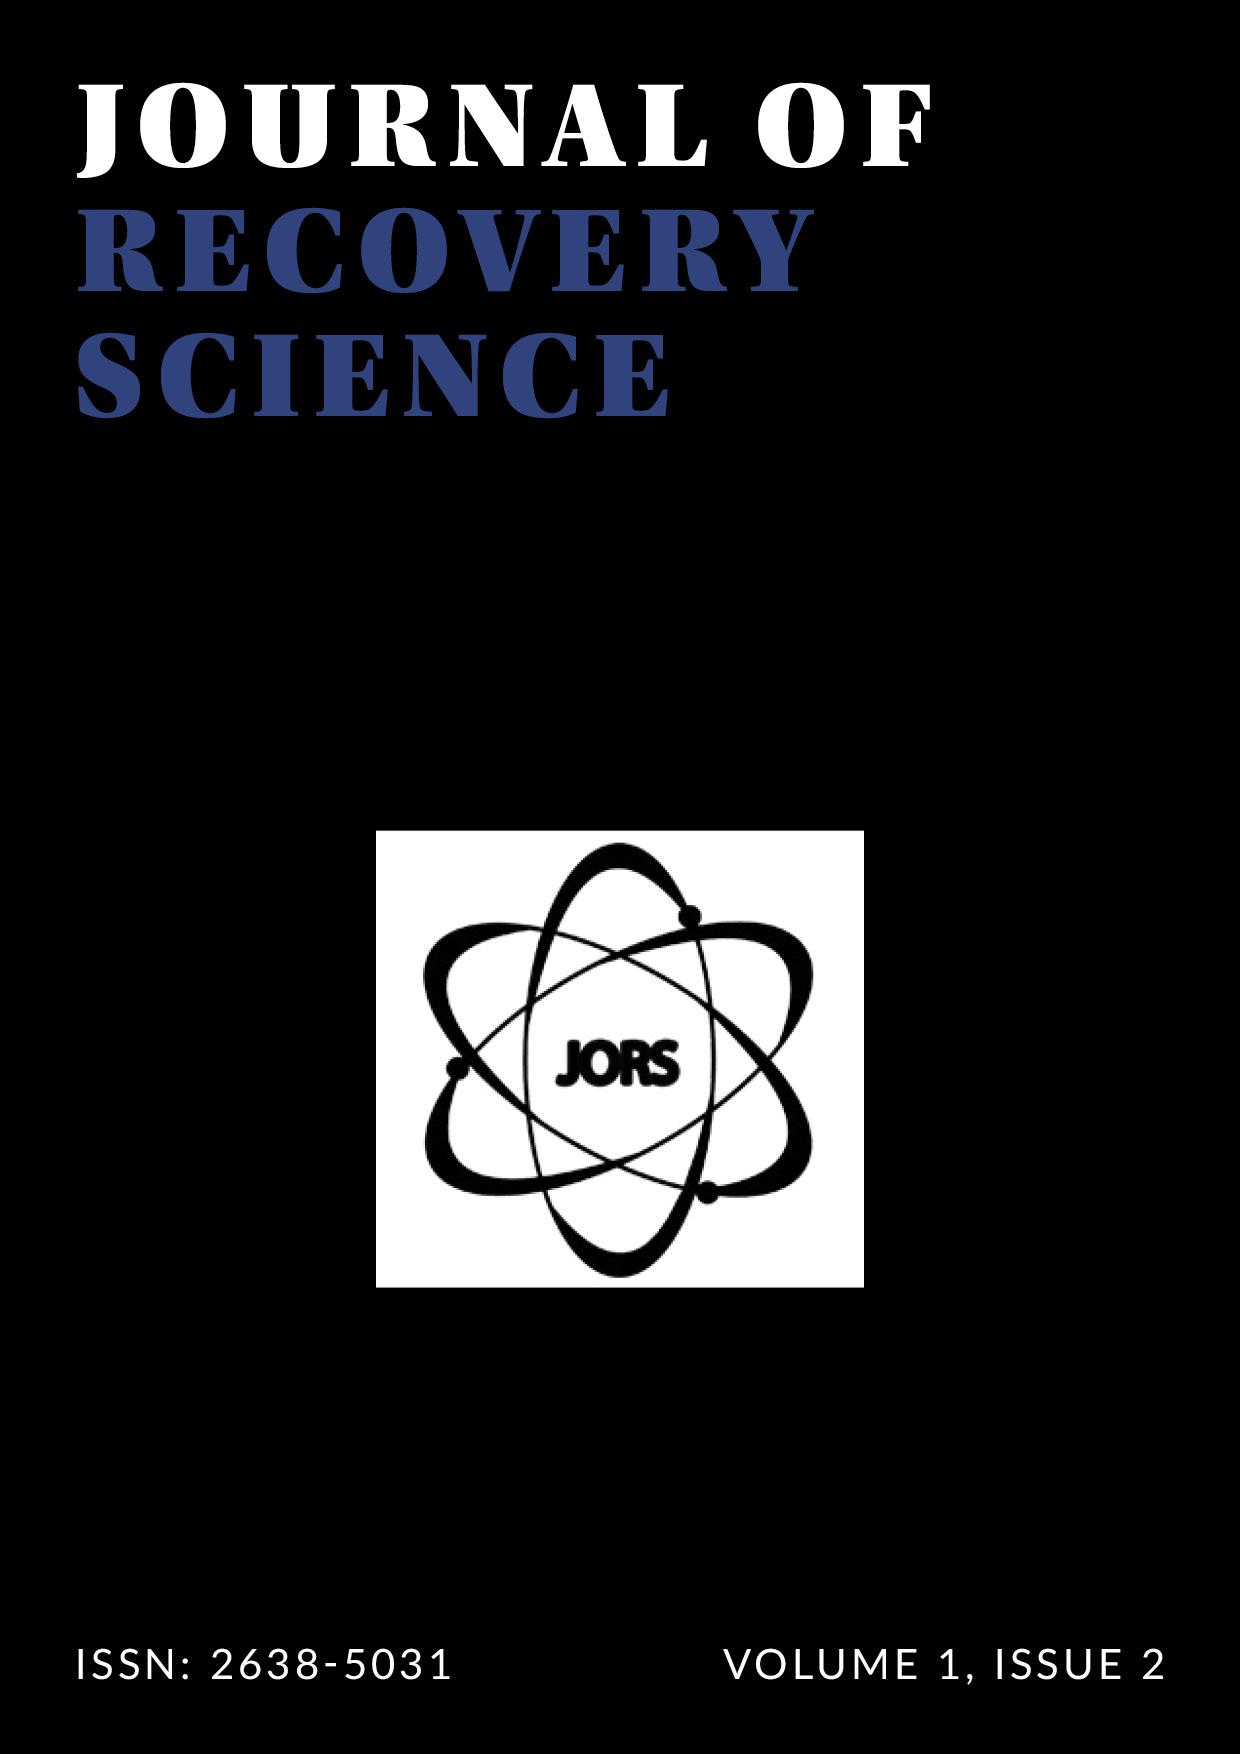 JORS Volume 1 Issue 2 ARHE Conference Proceedings